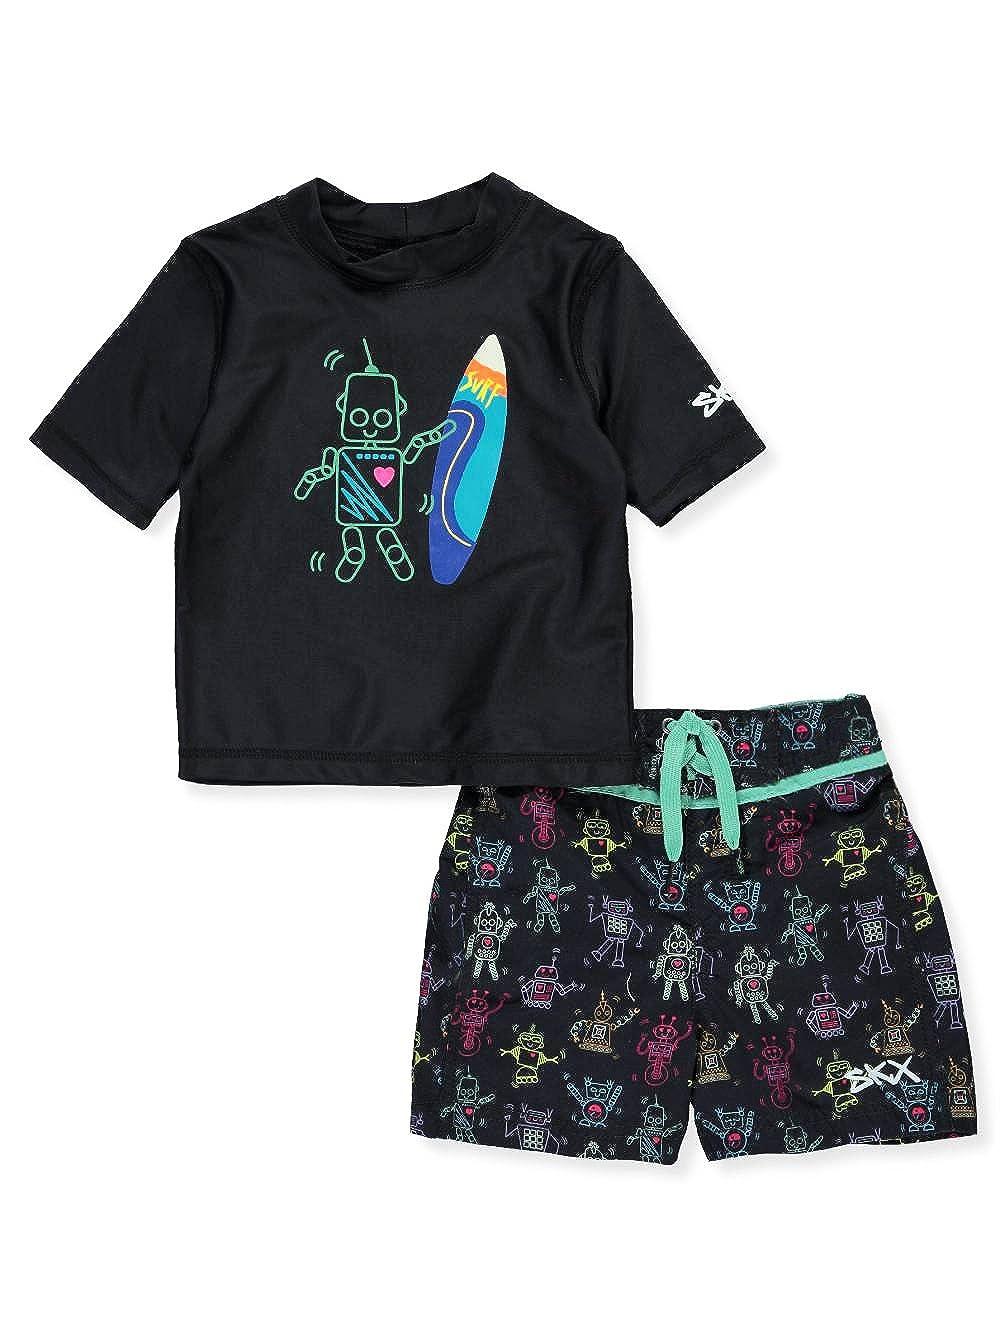 Skechers Baby Boys' Swim Suit Set with Rashgaurd Swim Shirt